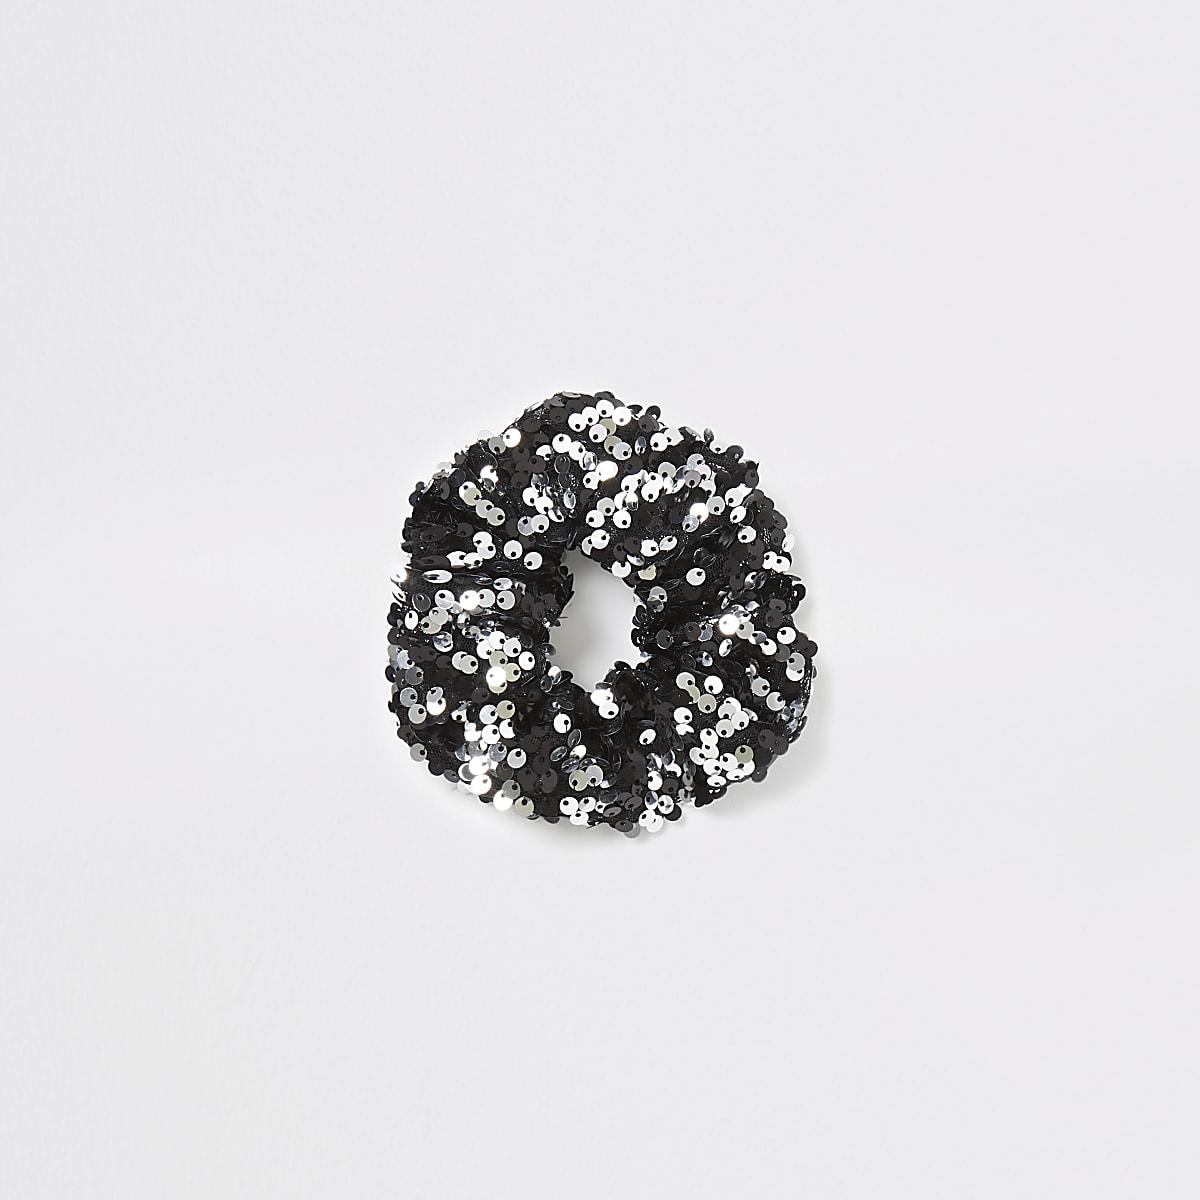 Black sequin scrunchie